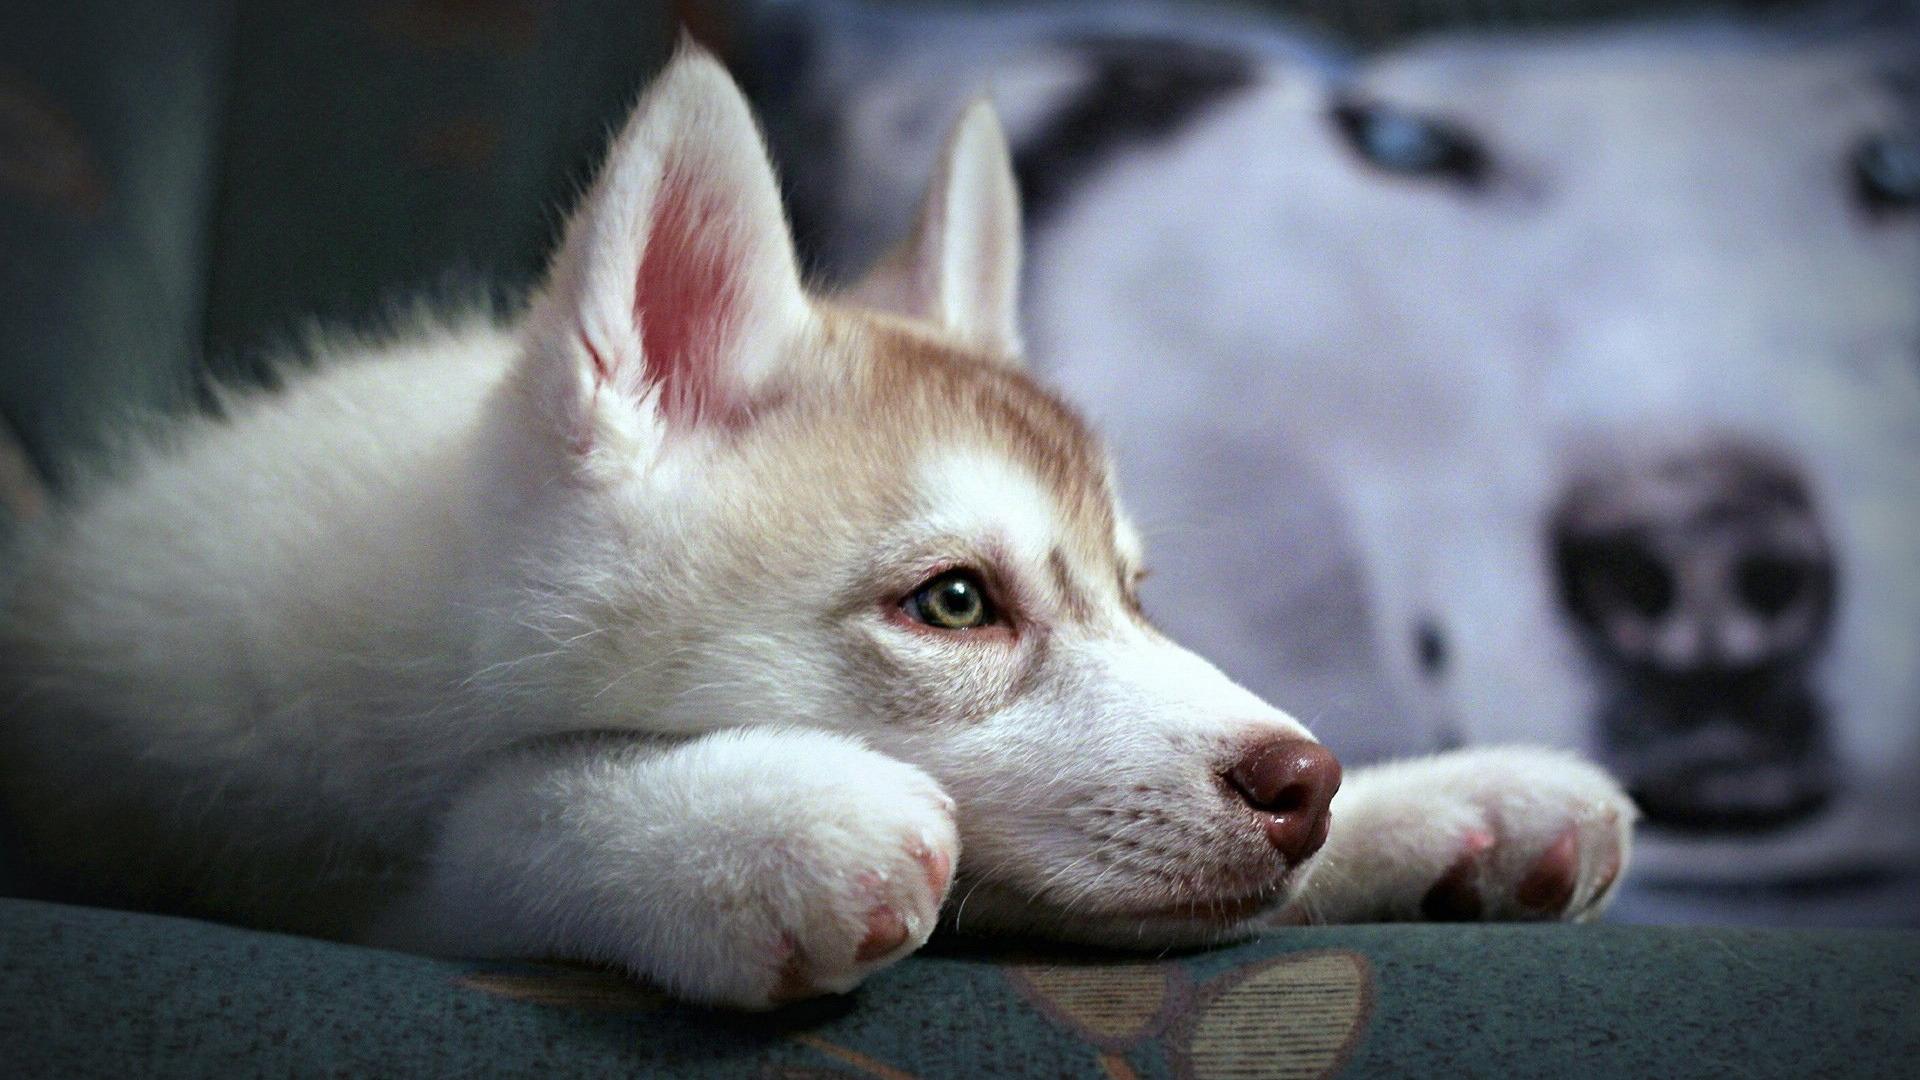 cute-husky-puppy-white-dog-wallpaper-1920x1080 jpgCute White Dog Wallpaper